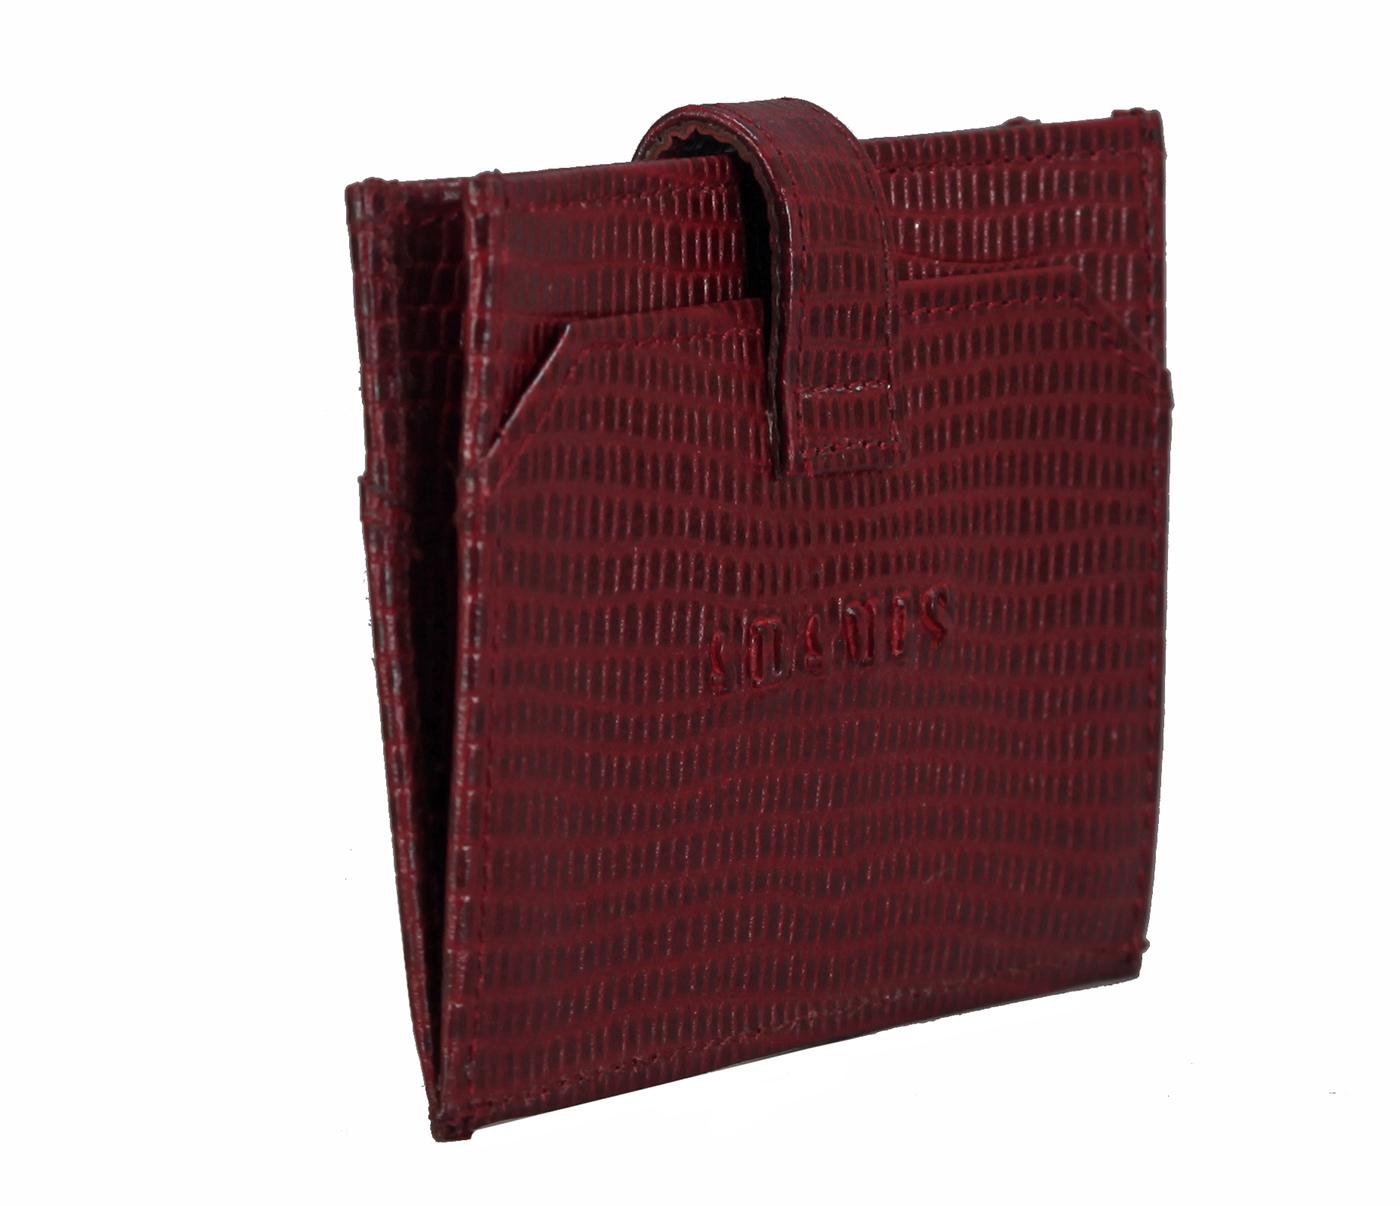 W272--Credit Card cum business card holder in Genuine leather - Wine/Black